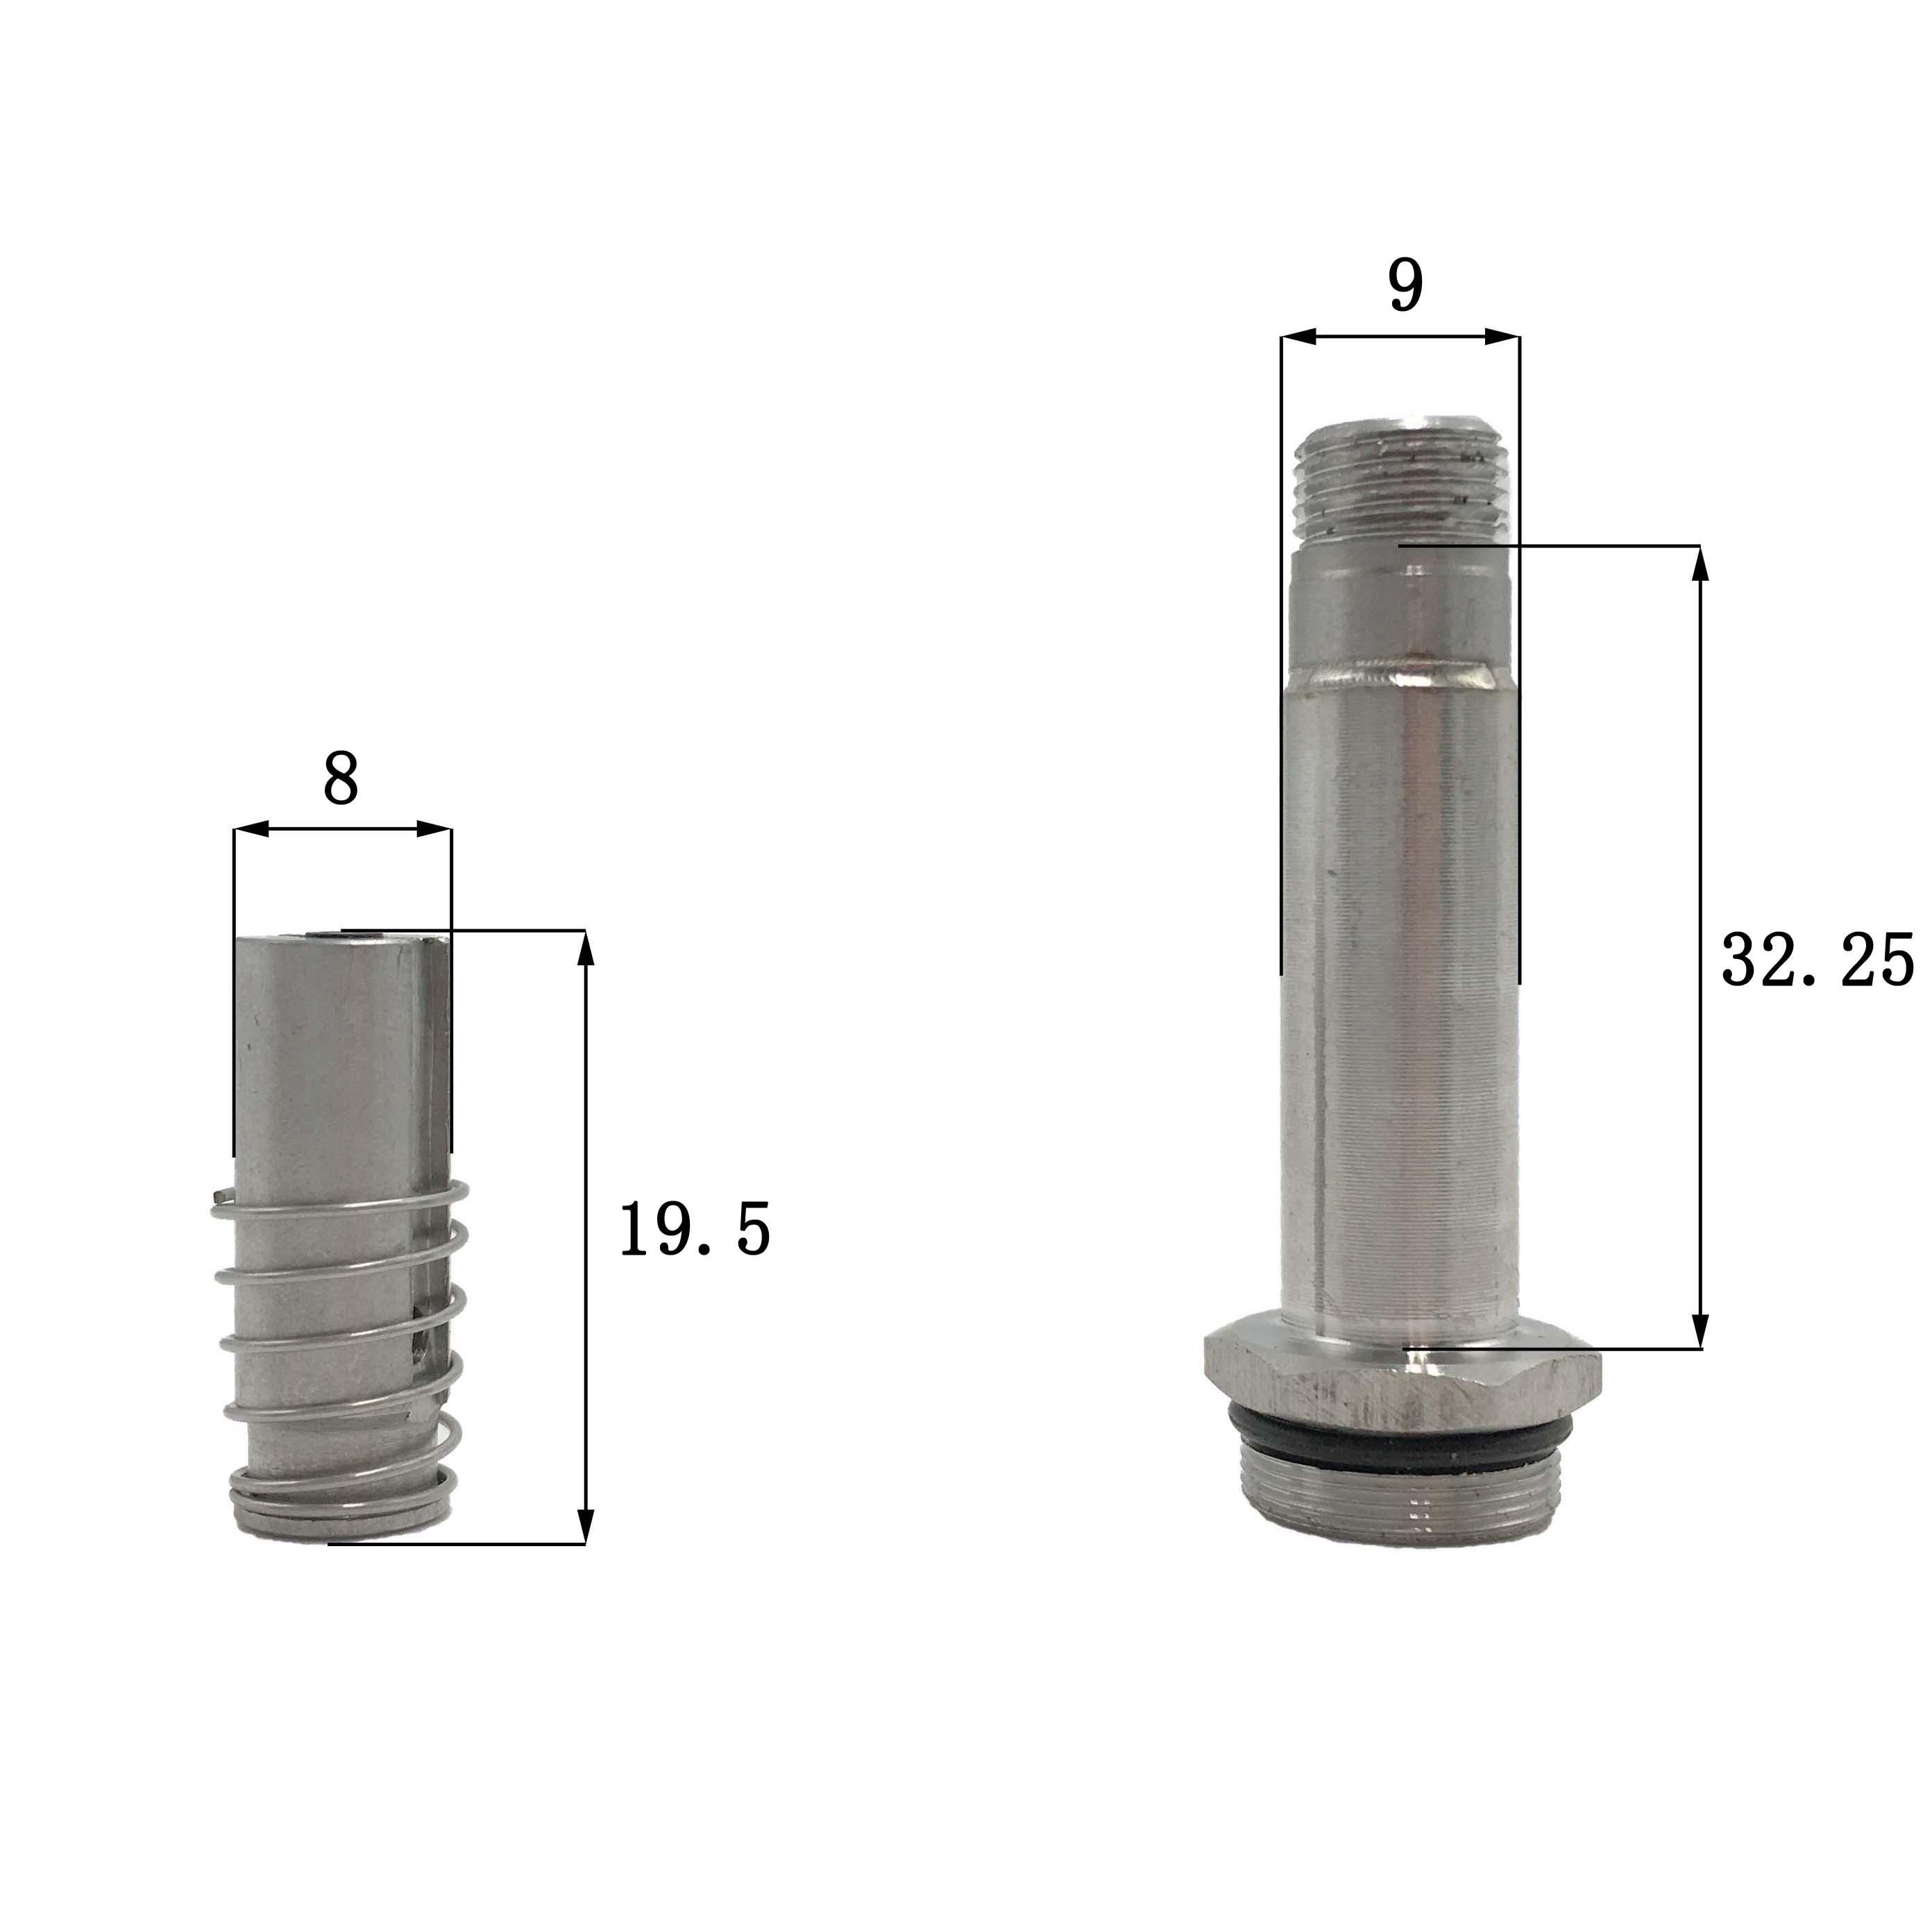 Dimension of BAPC209030031 Armature Assembly: